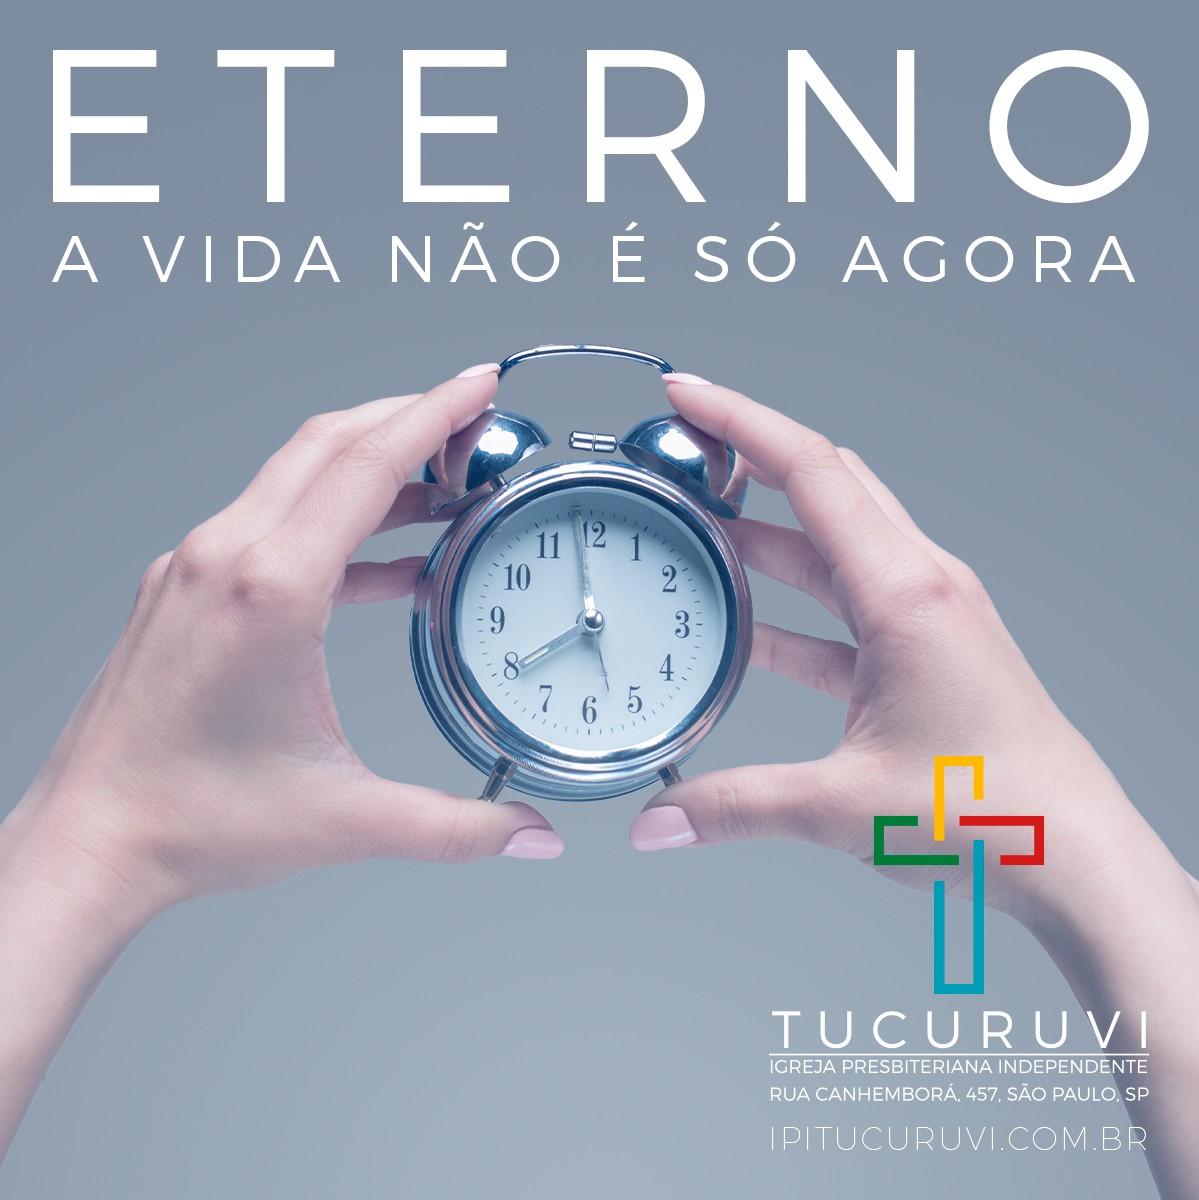 Eterno: a vida é eterna